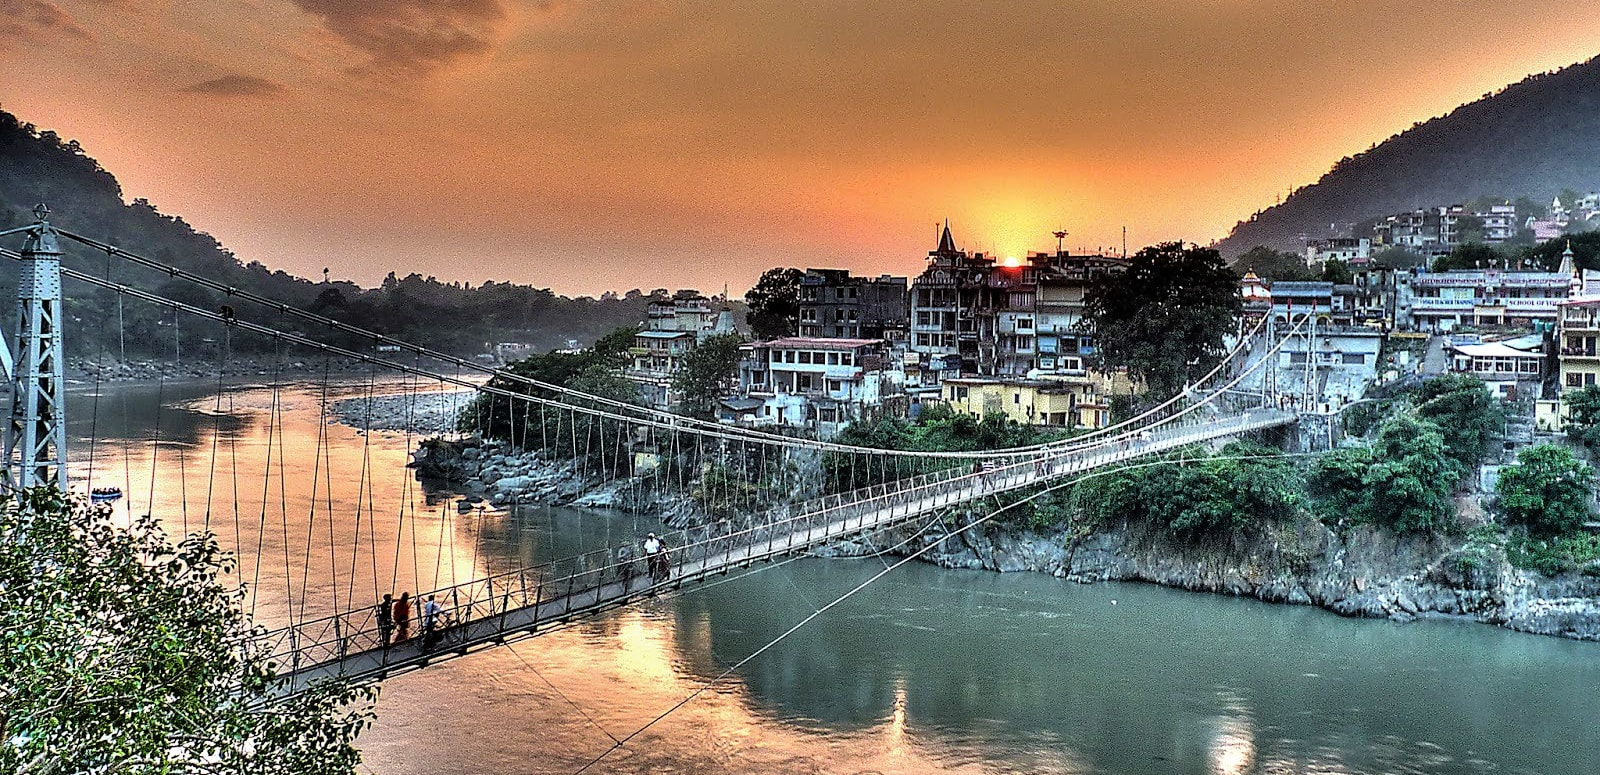 1571226349_lakshman-jhula-rishikesh.jpg